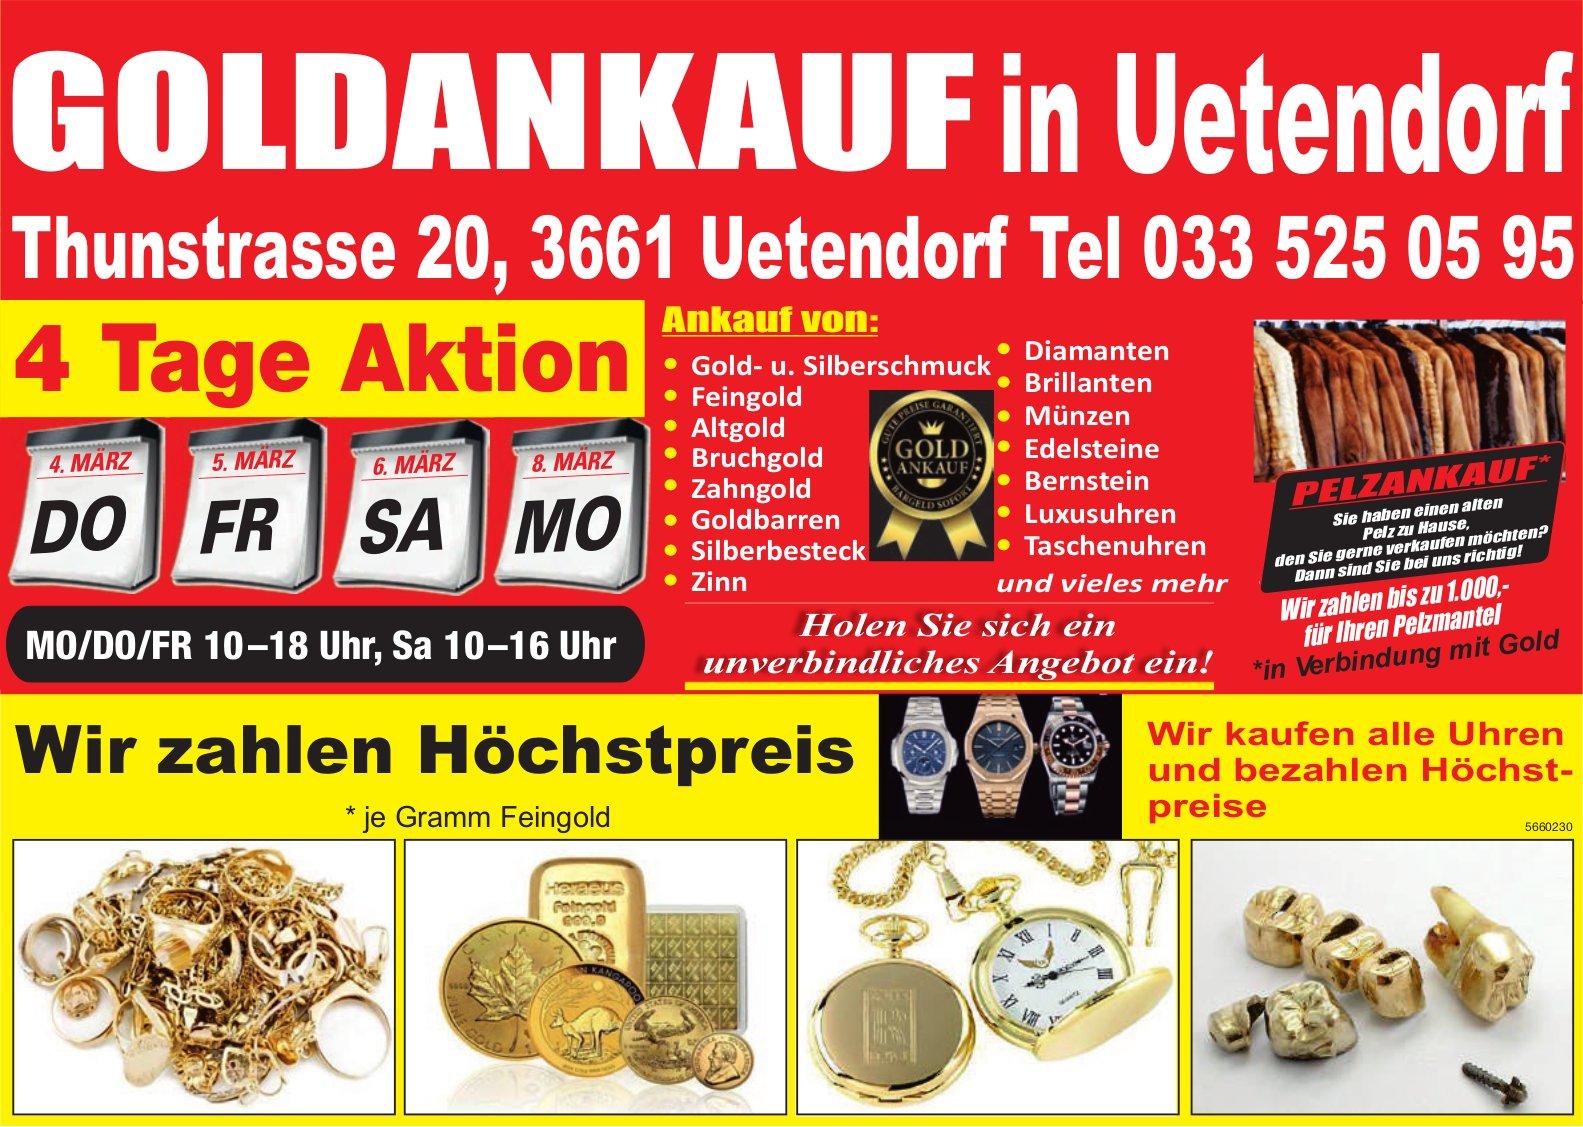 Goldankauf, 4. - 8 . März, Uetendorf